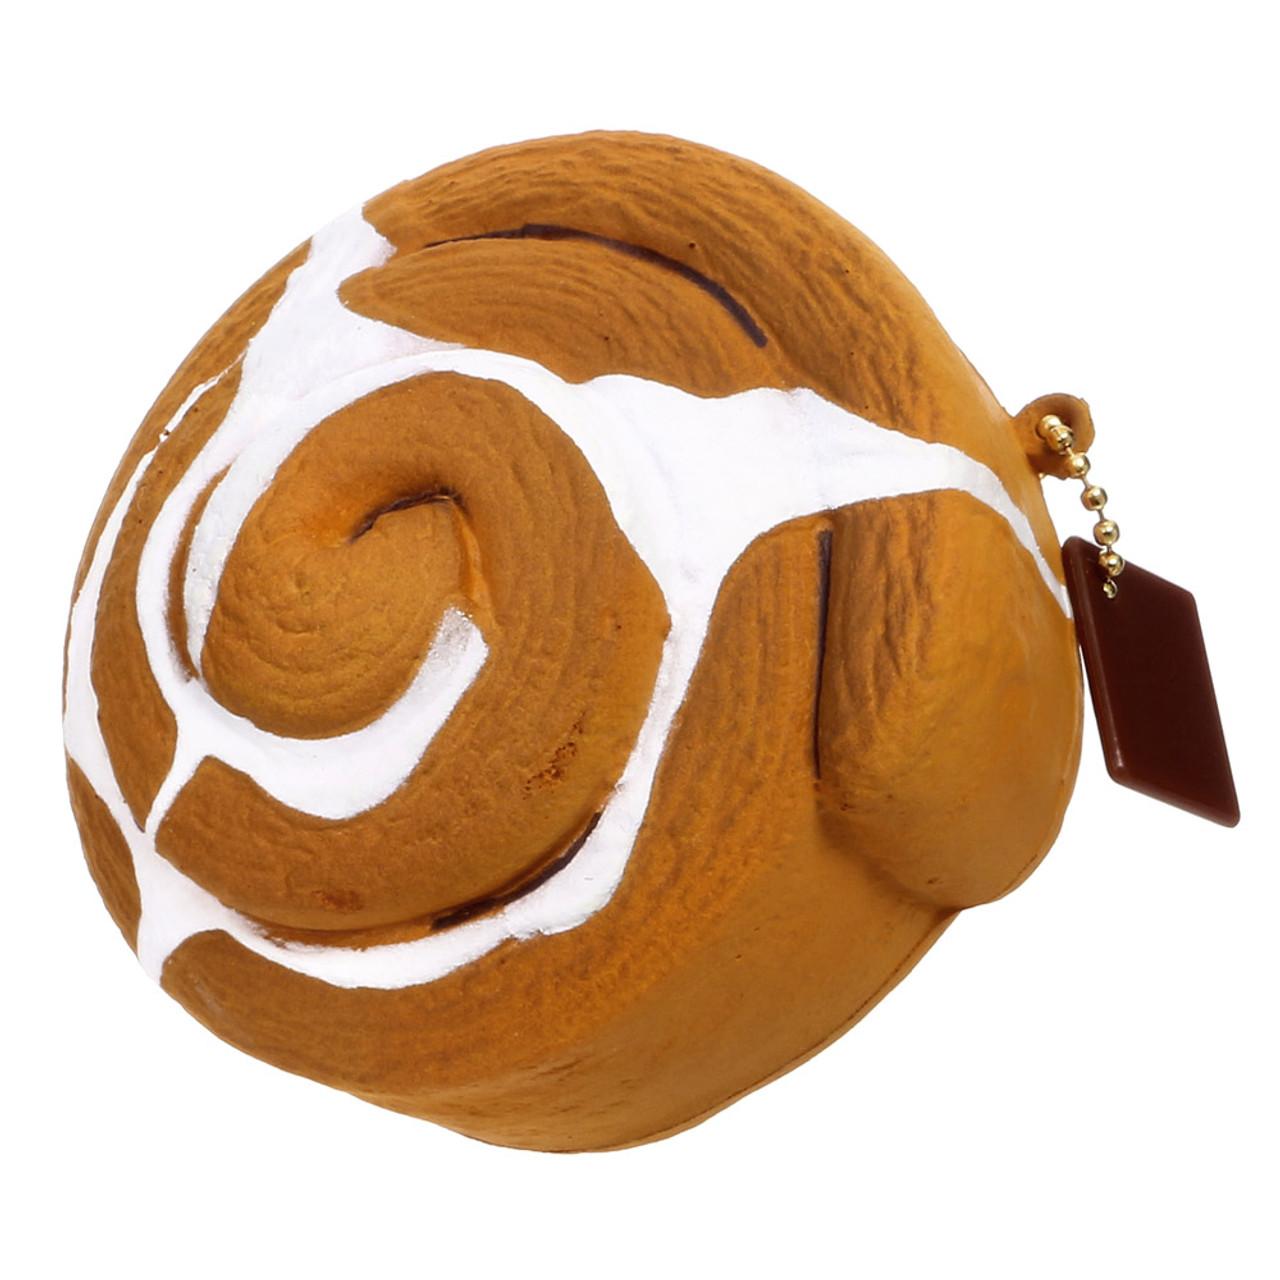 Café De N Coffee House Cinnamon Roll Plane Squishy Toys Charms ( 45 Degree Angle )